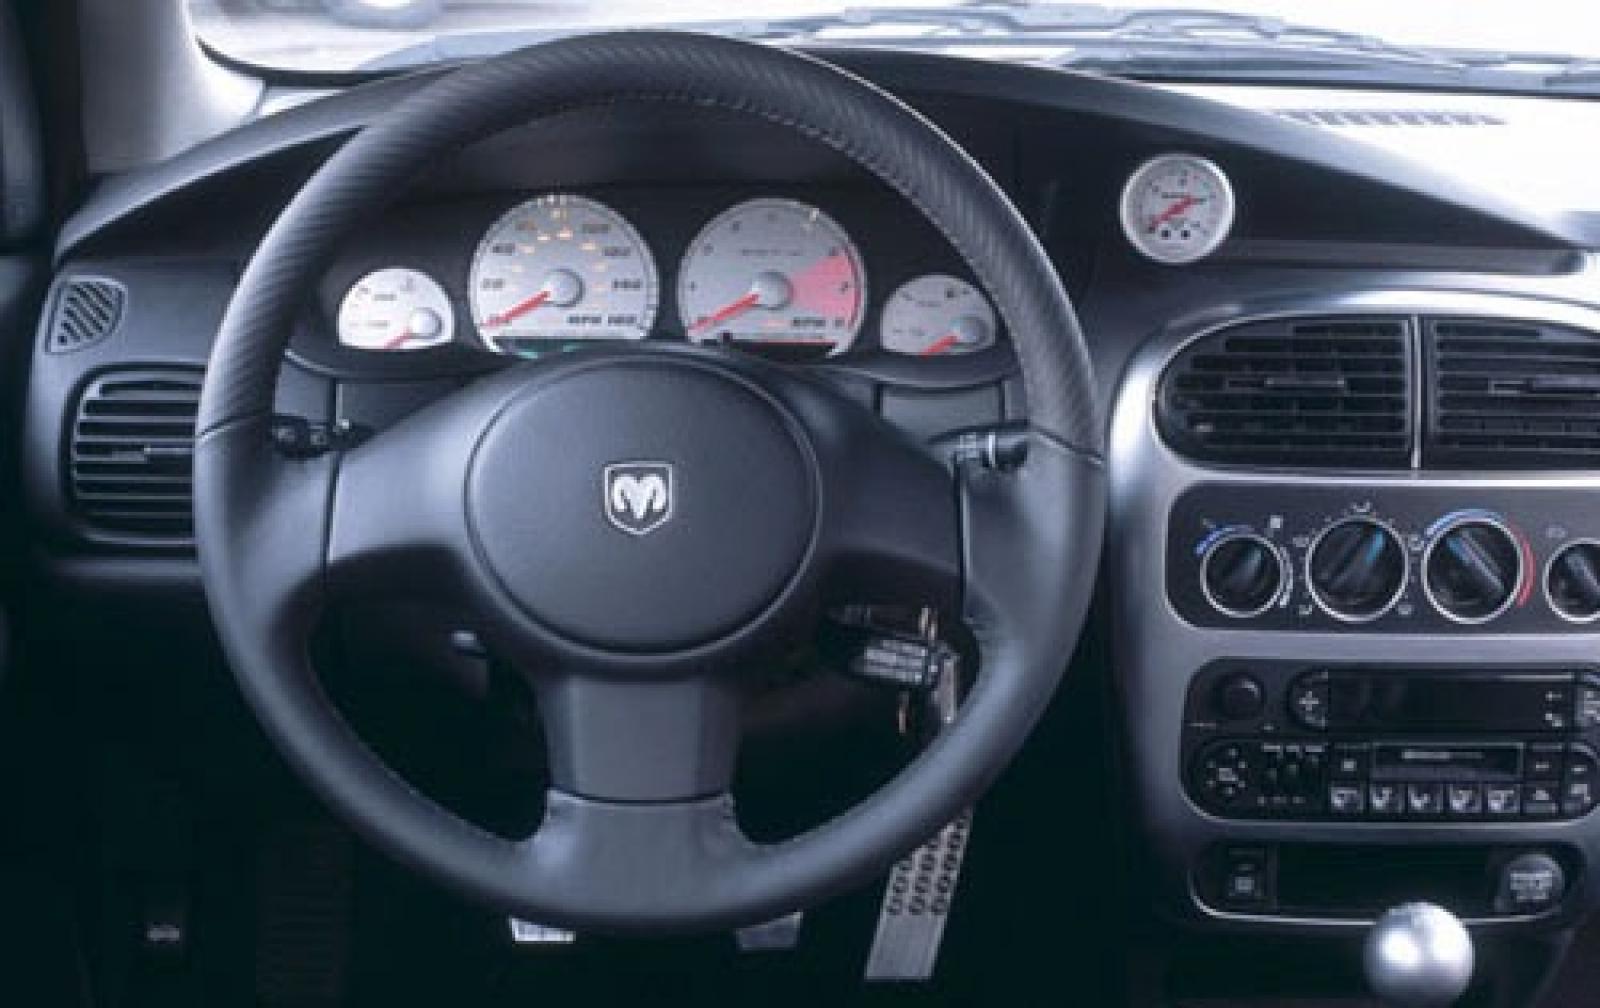 800 1024 1280 1600 origin 2003 Dodge Neon ...